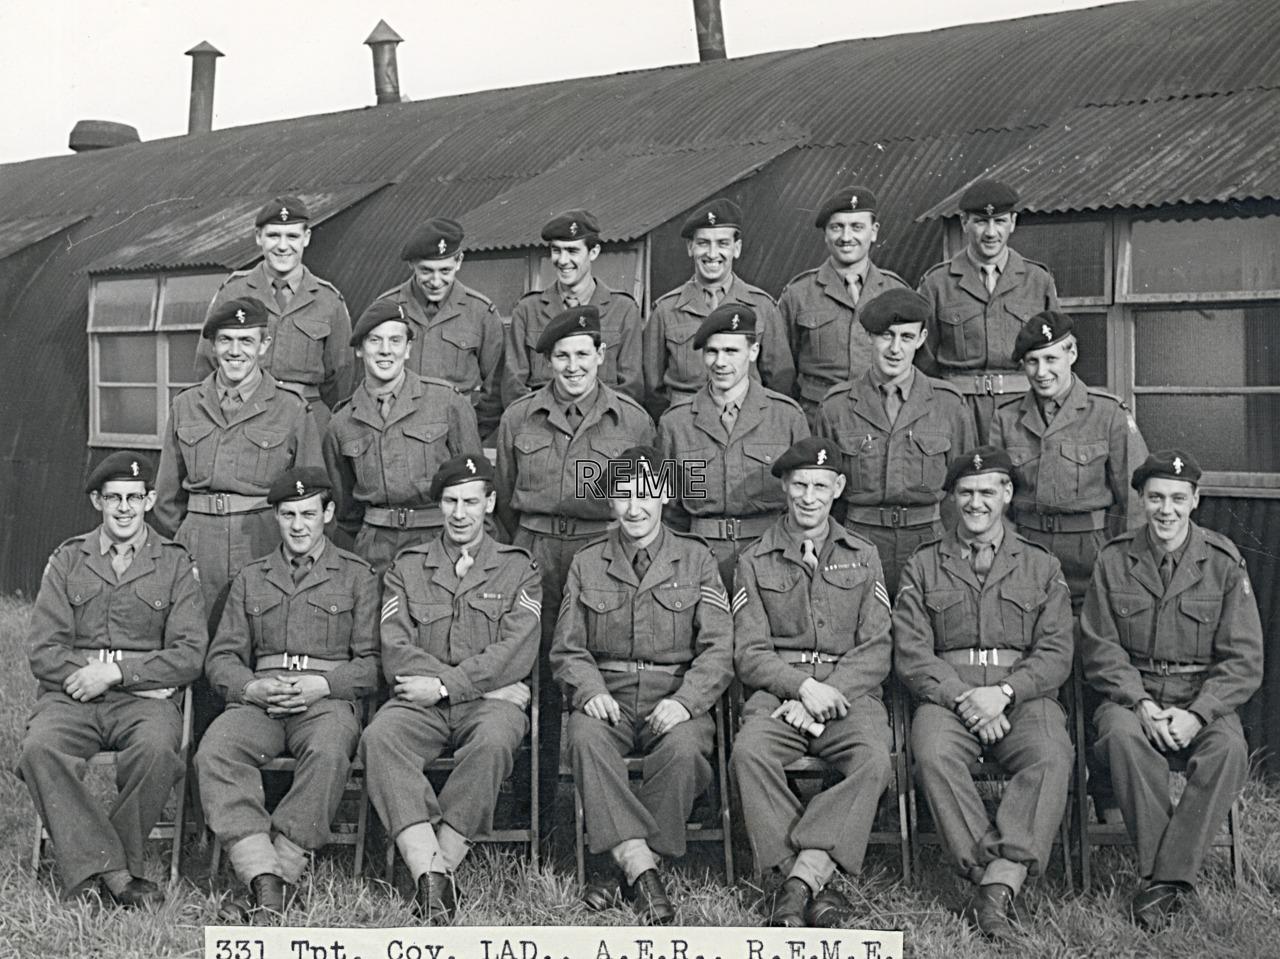 331 Transport Company Light Aid Detachment (LAD). Annual Training, 1955.